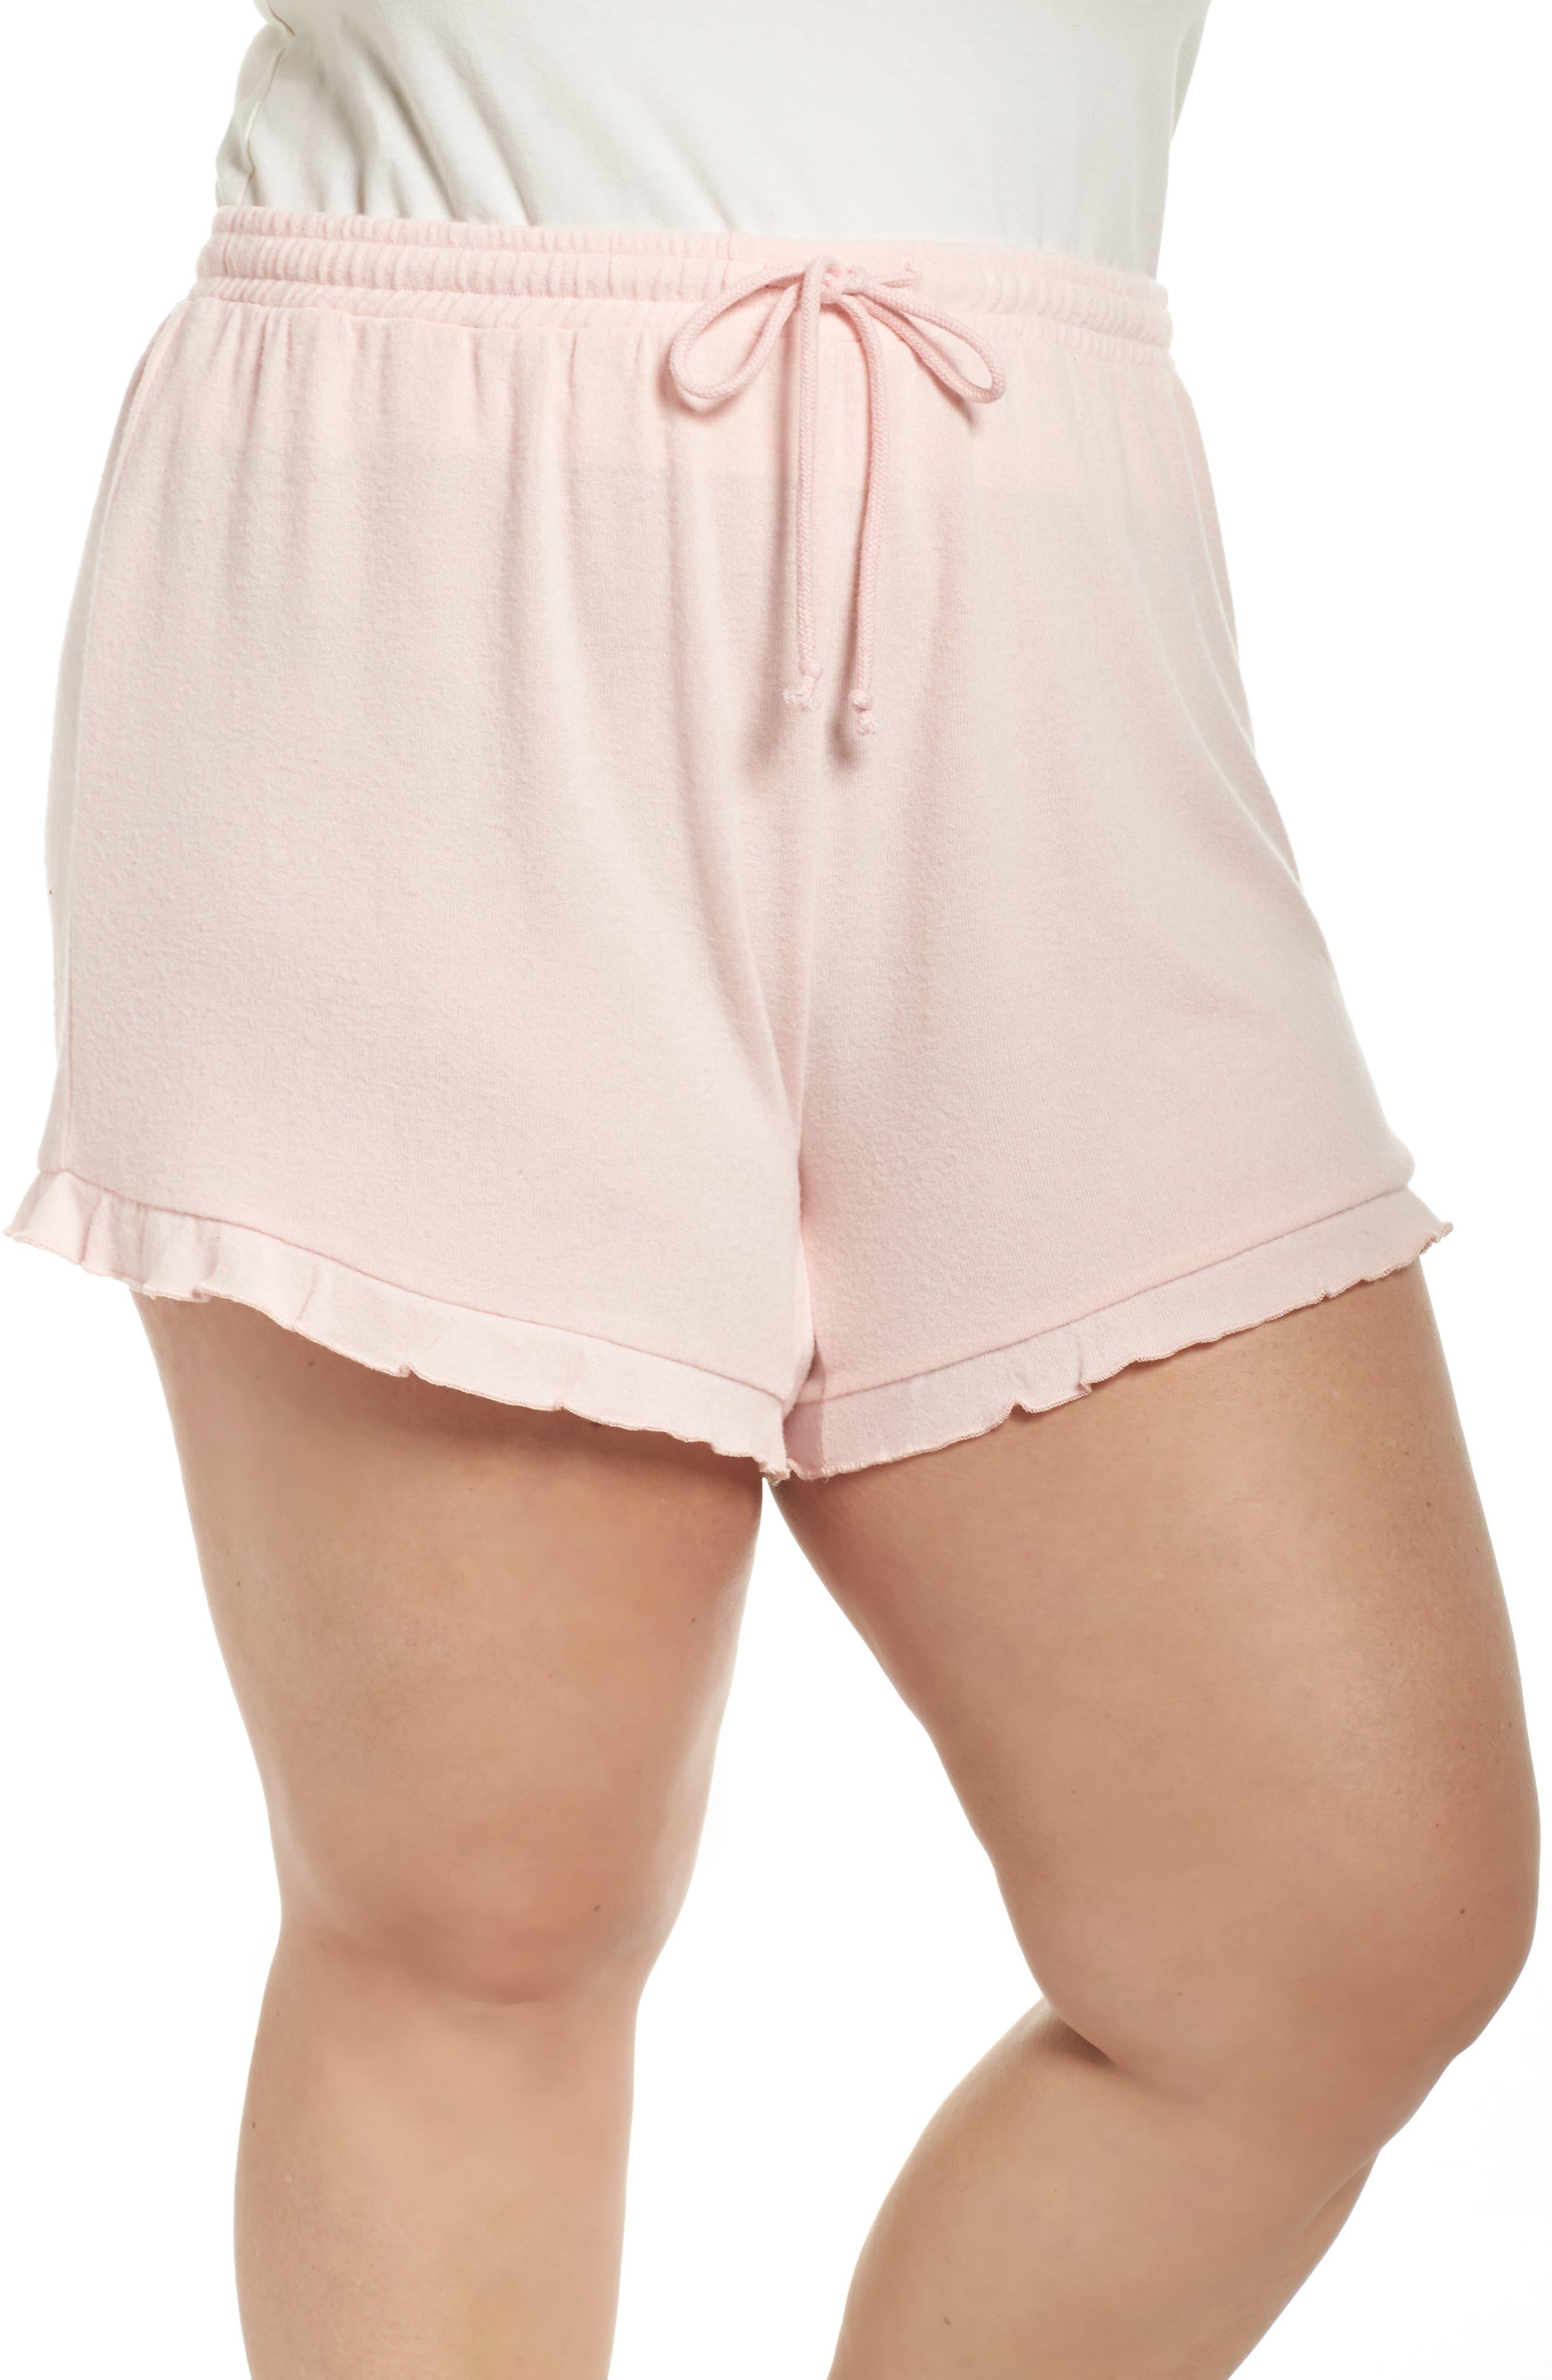 Ruffle Lounge Shorts,                         Main,                         color, Blush